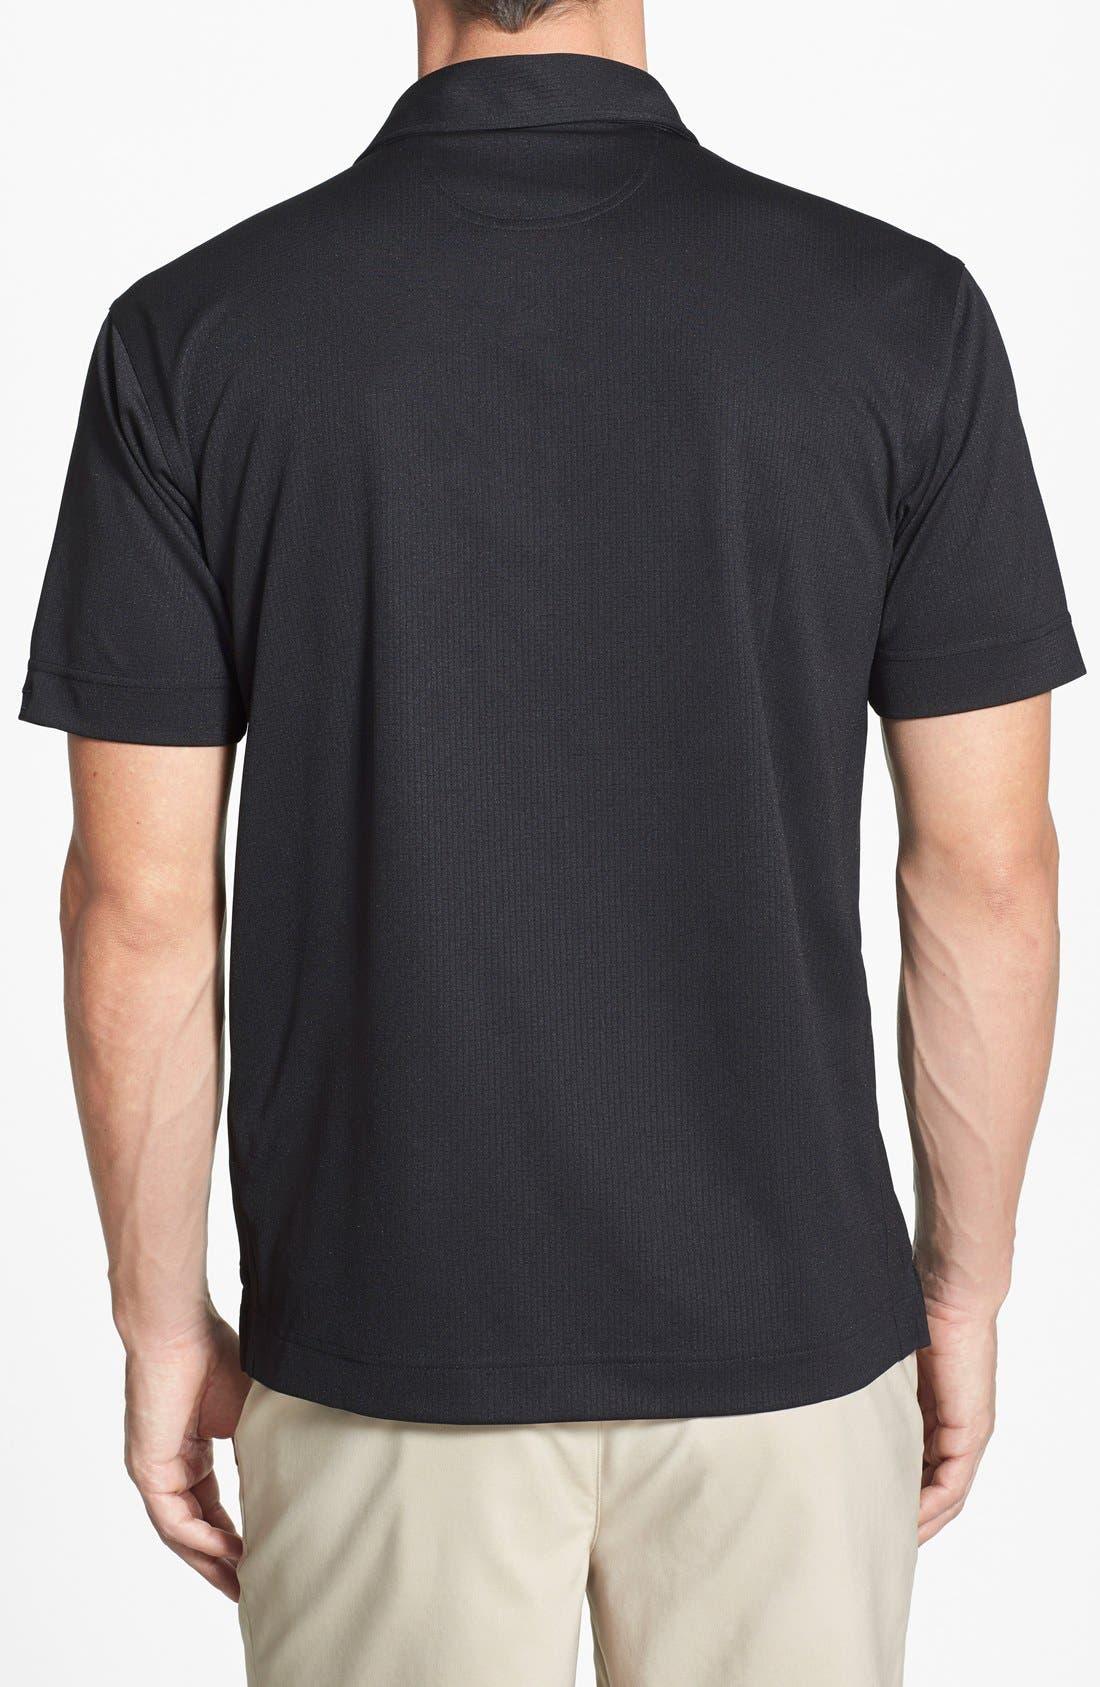 Atlanta Falcons - Genre DryTec Moisture Wicking Polo,                             Alternate thumbnail 2, color,                             Black